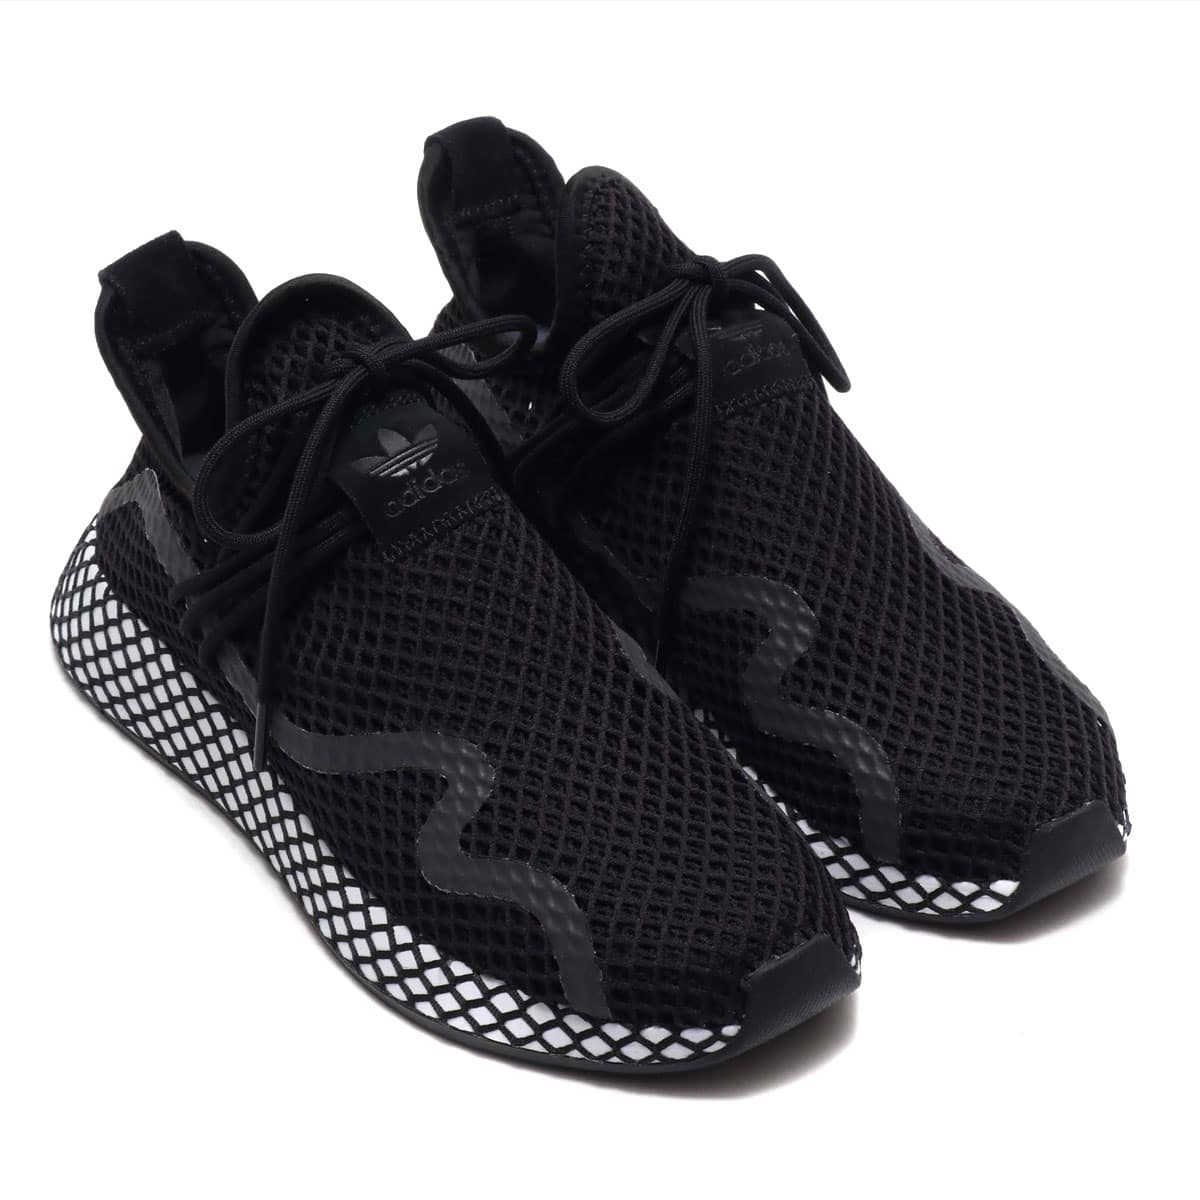 adidas Originals DEERUPT NEW RUNNER CORE BLACK/CORE BLACK/RUNNING WHITE 19SS-I_photo_large